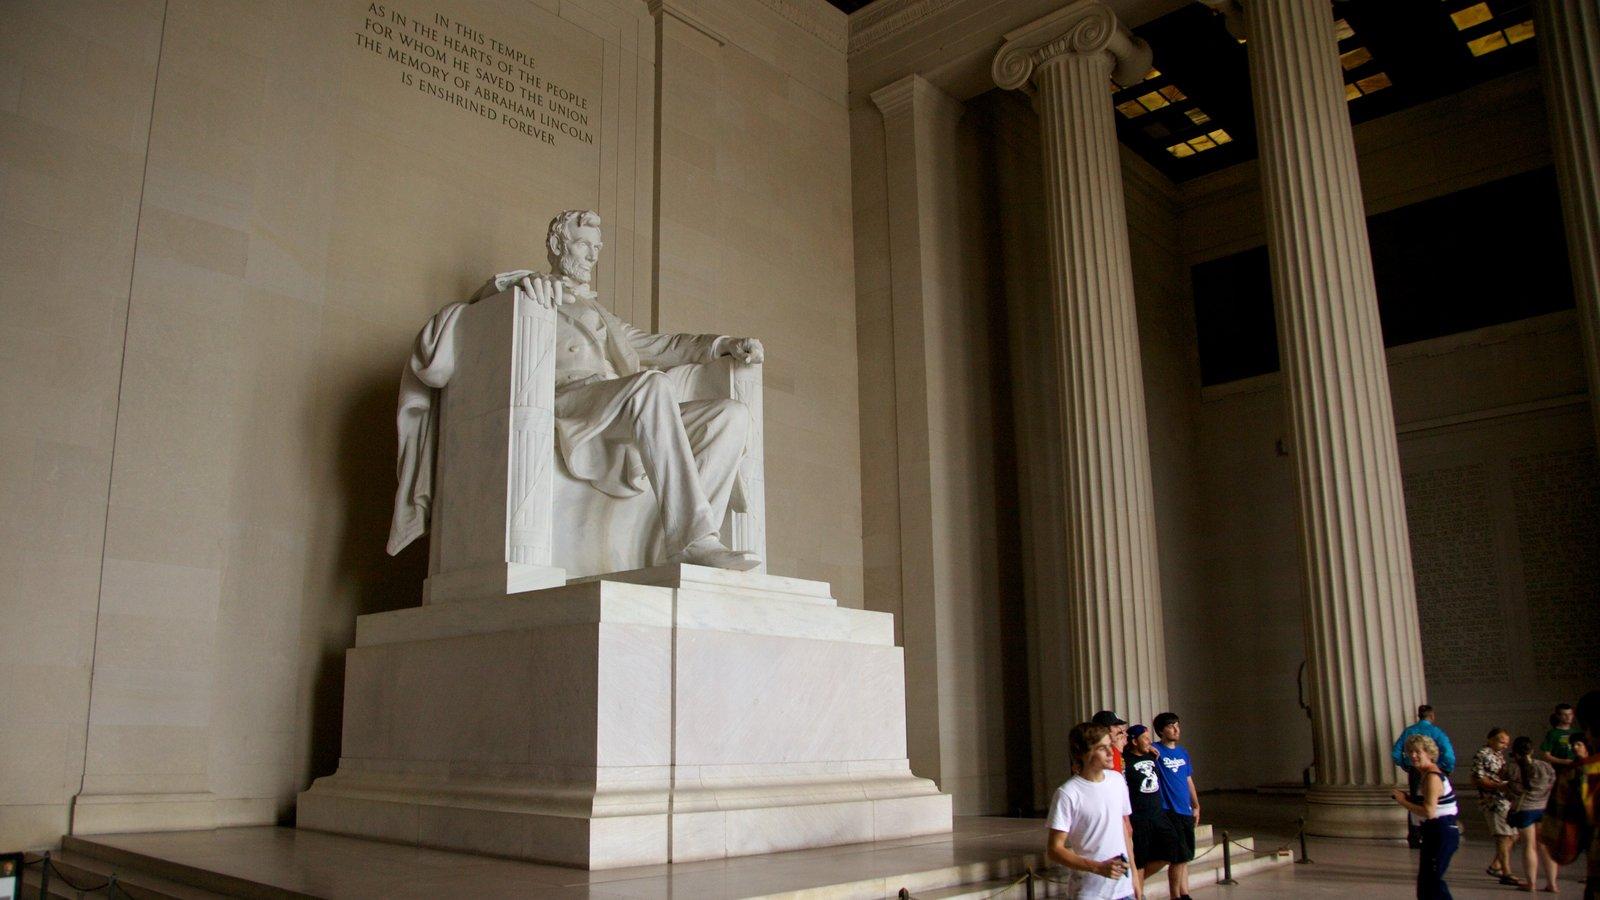 Lincoln Memorial showing a memorial